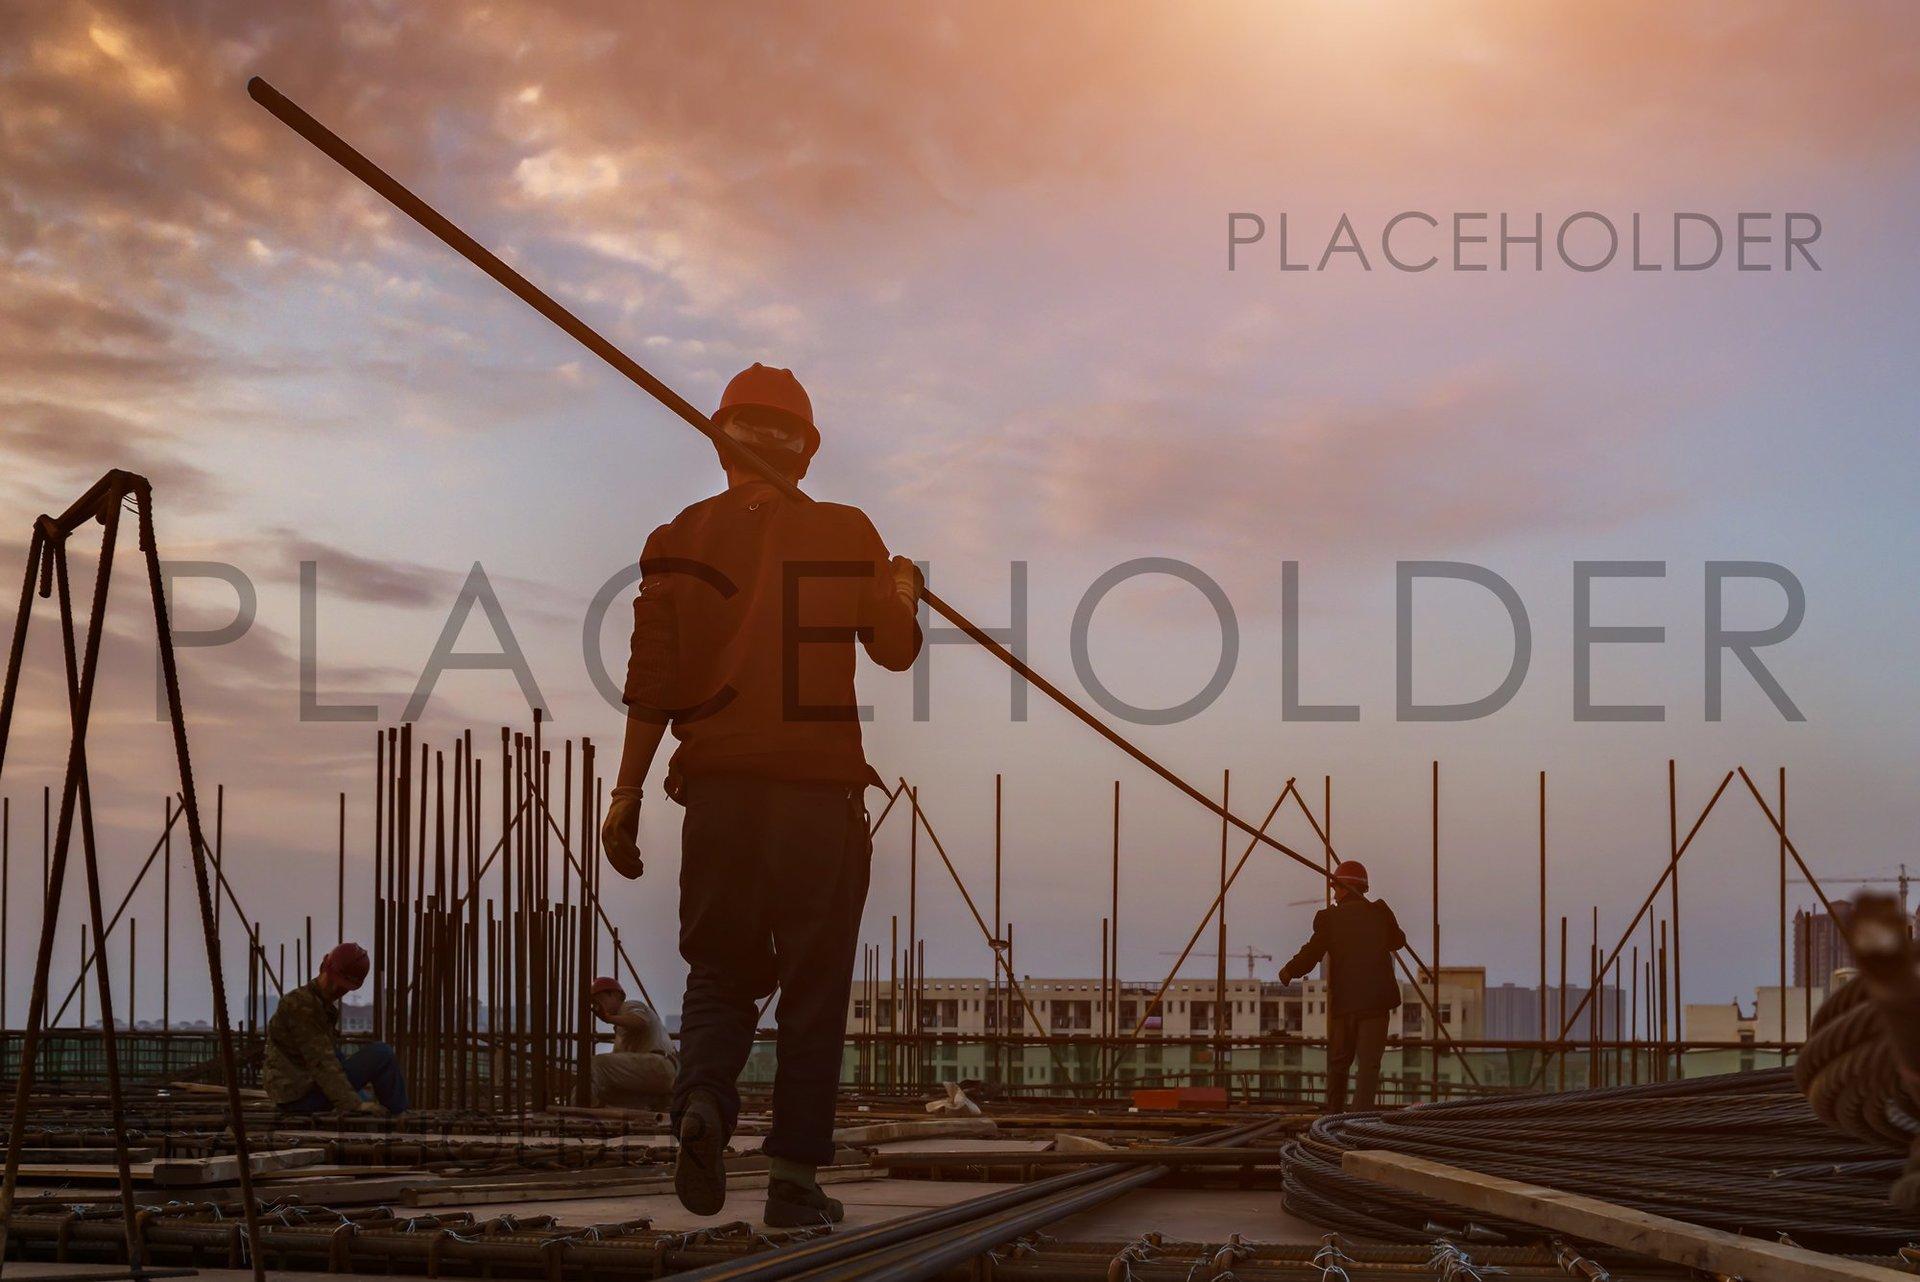 ingegnere e operai in un cantiere edile